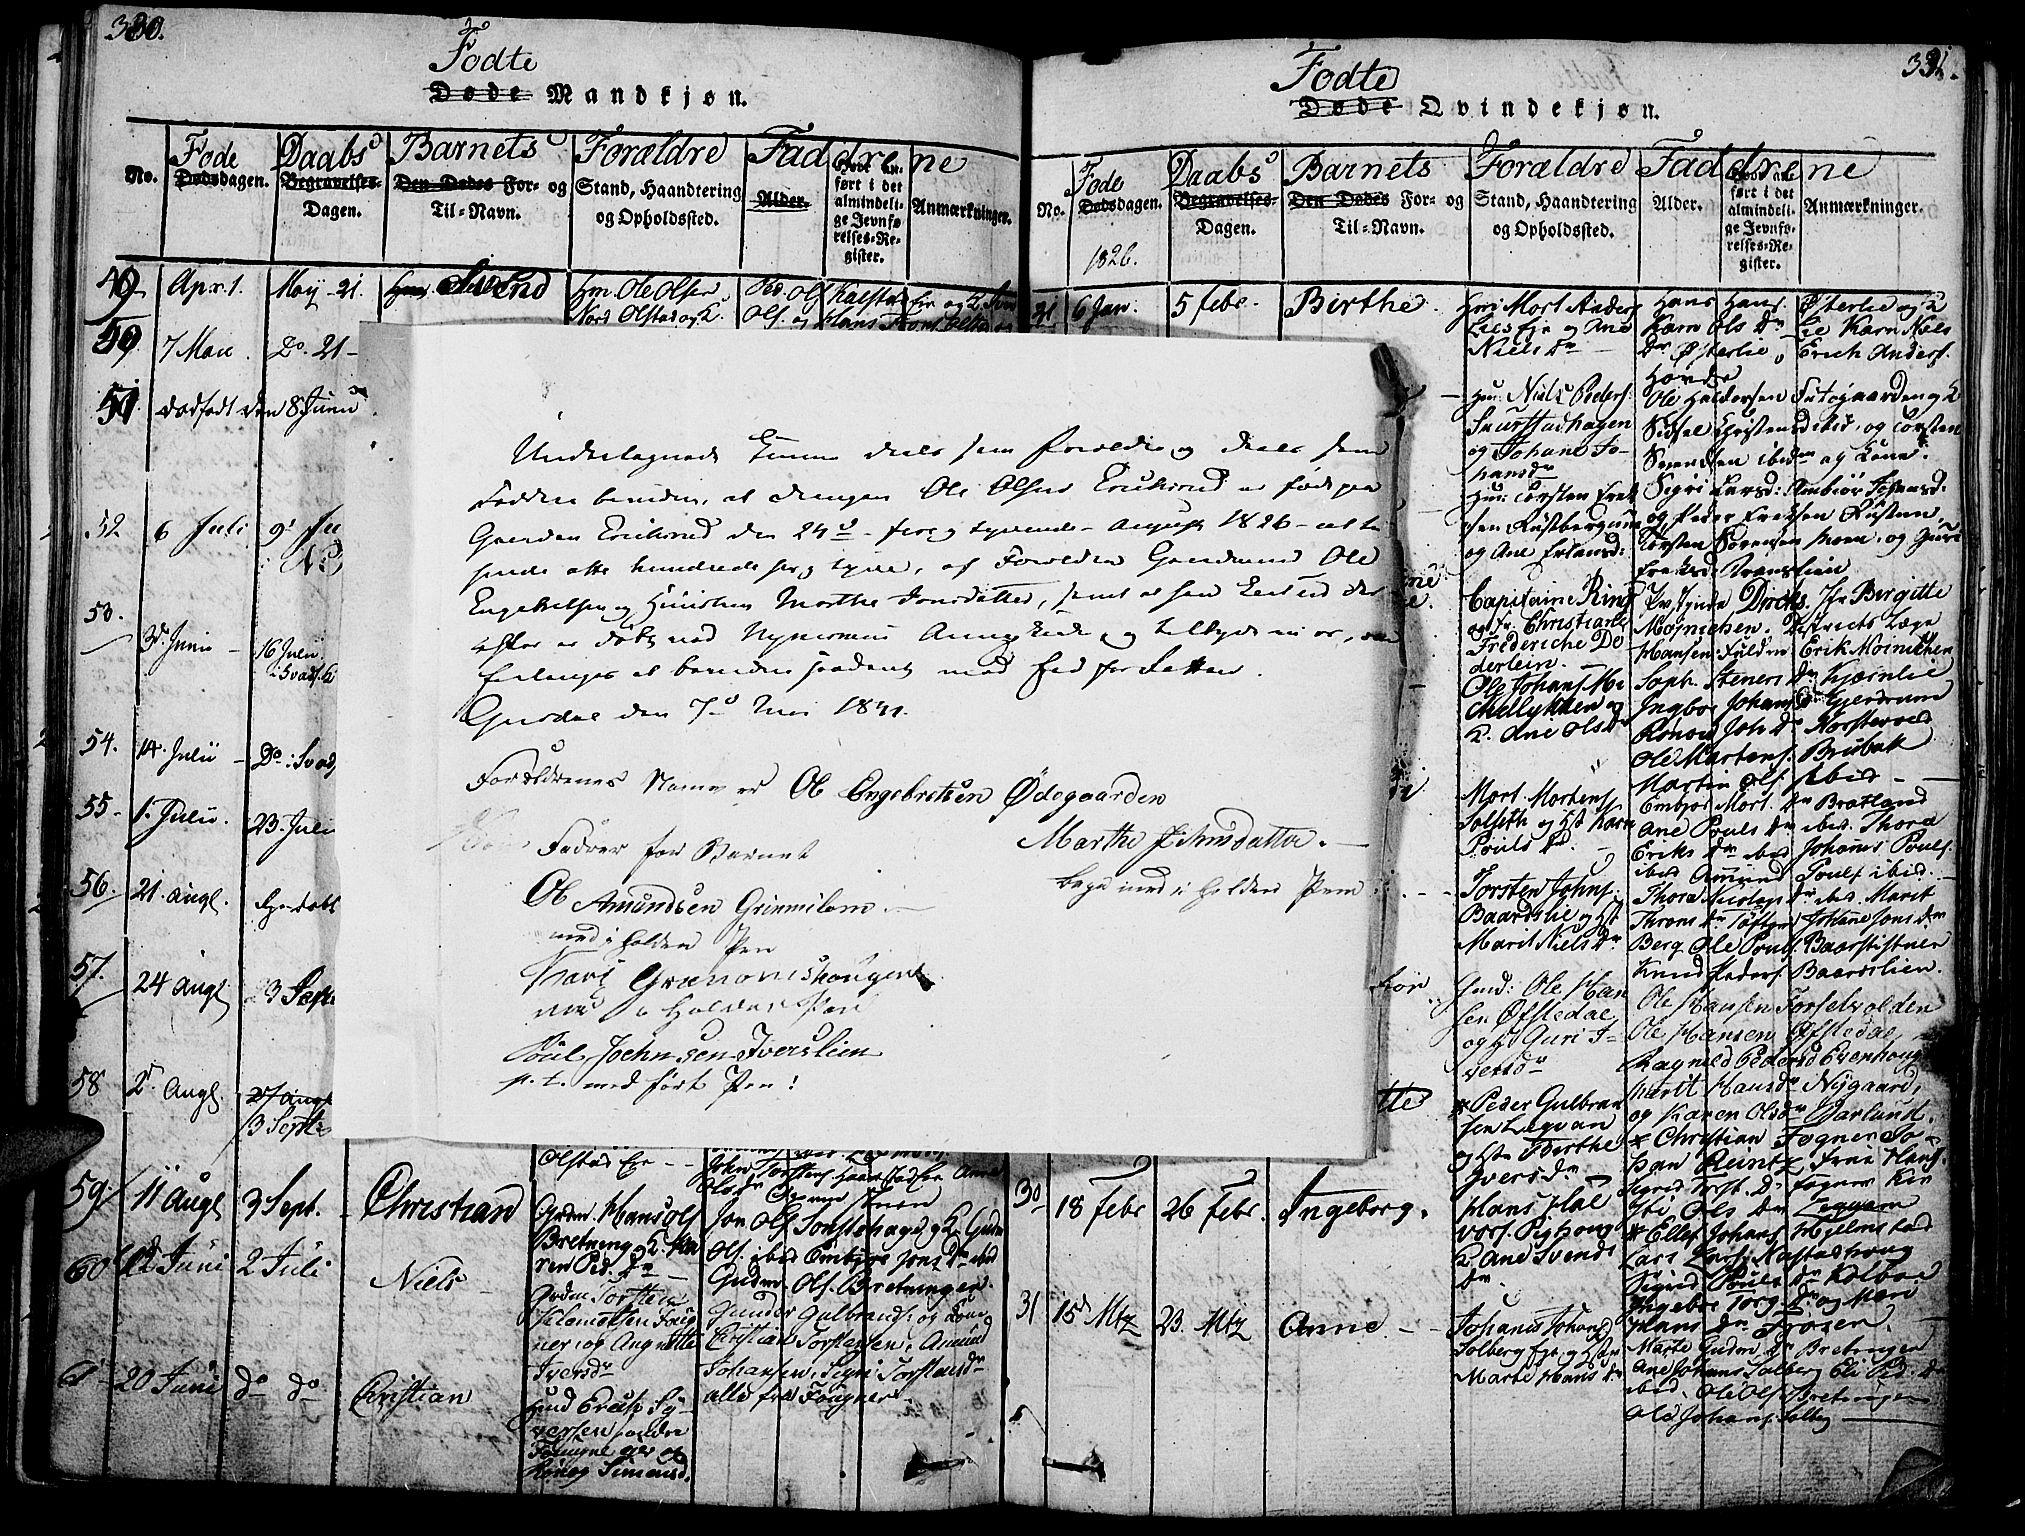 SAH, Gausdal prestekontor, Ministerialbok nr. 5, 1817-1829, s. 330-331